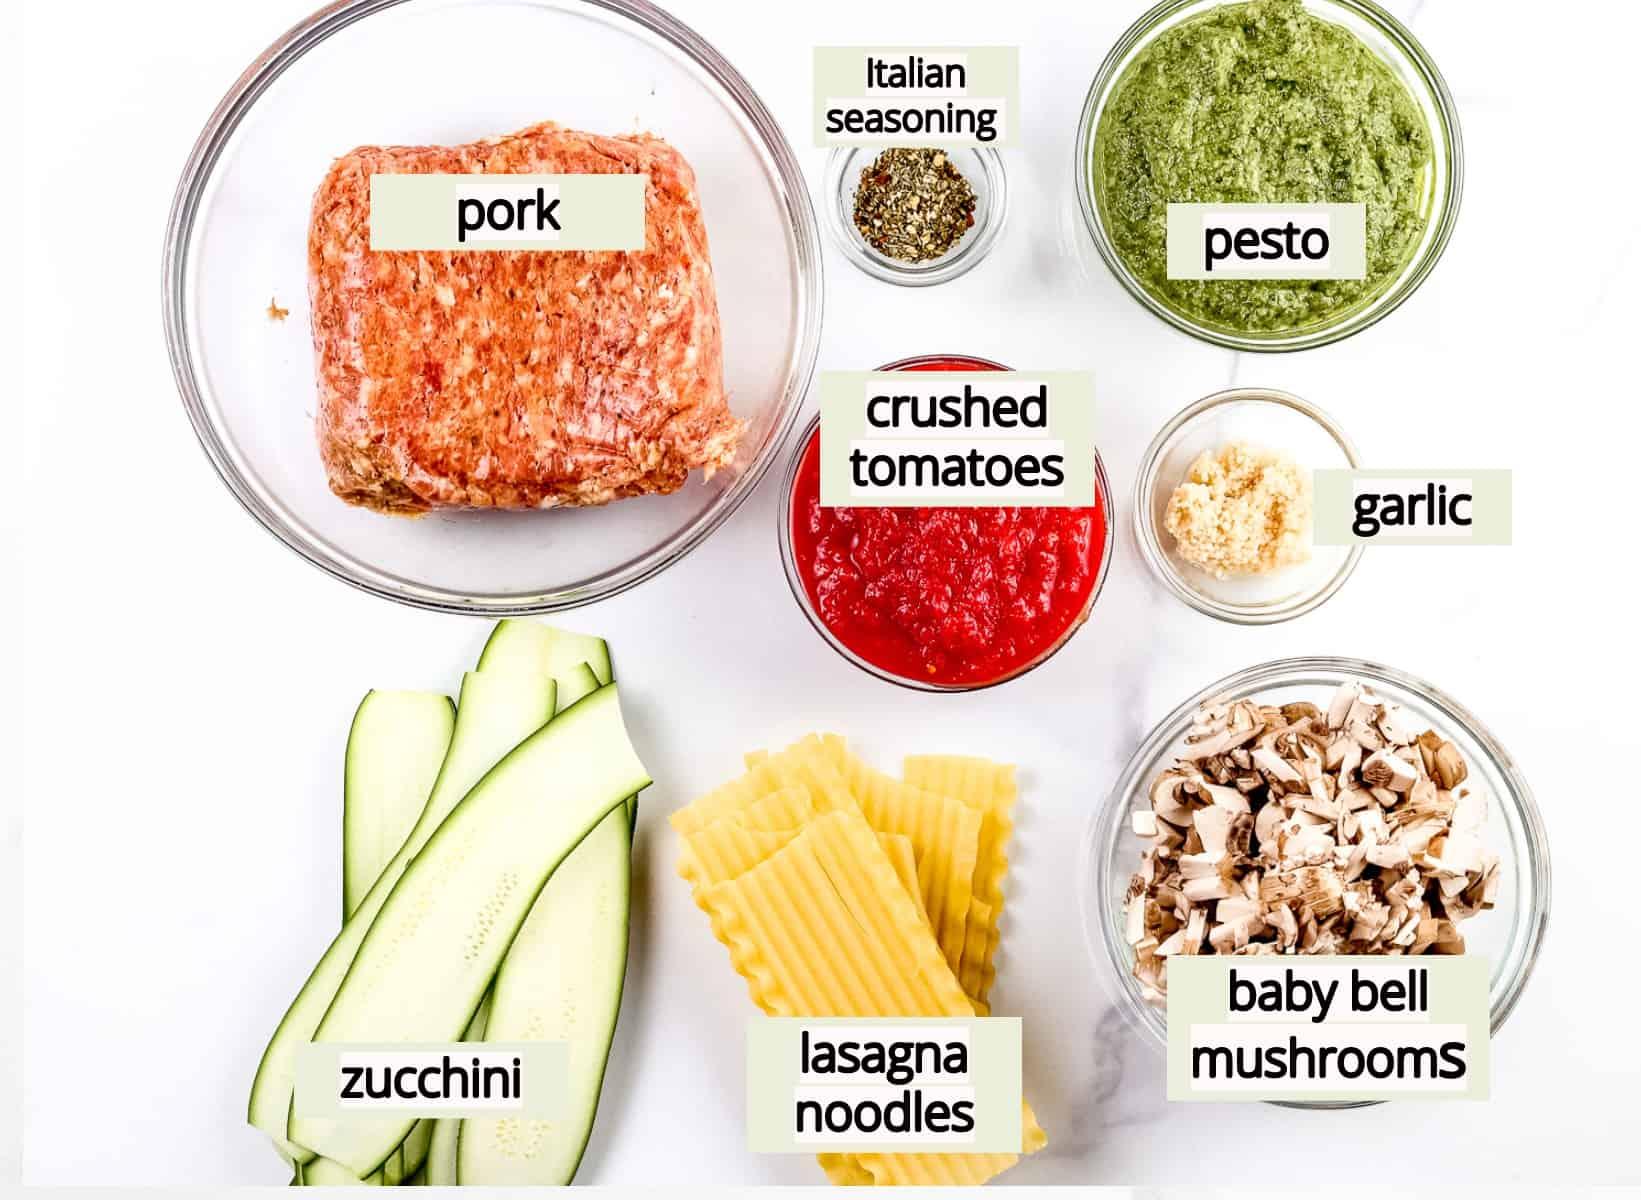 Image of ingredients needed to make dairy free lasagna recipe.